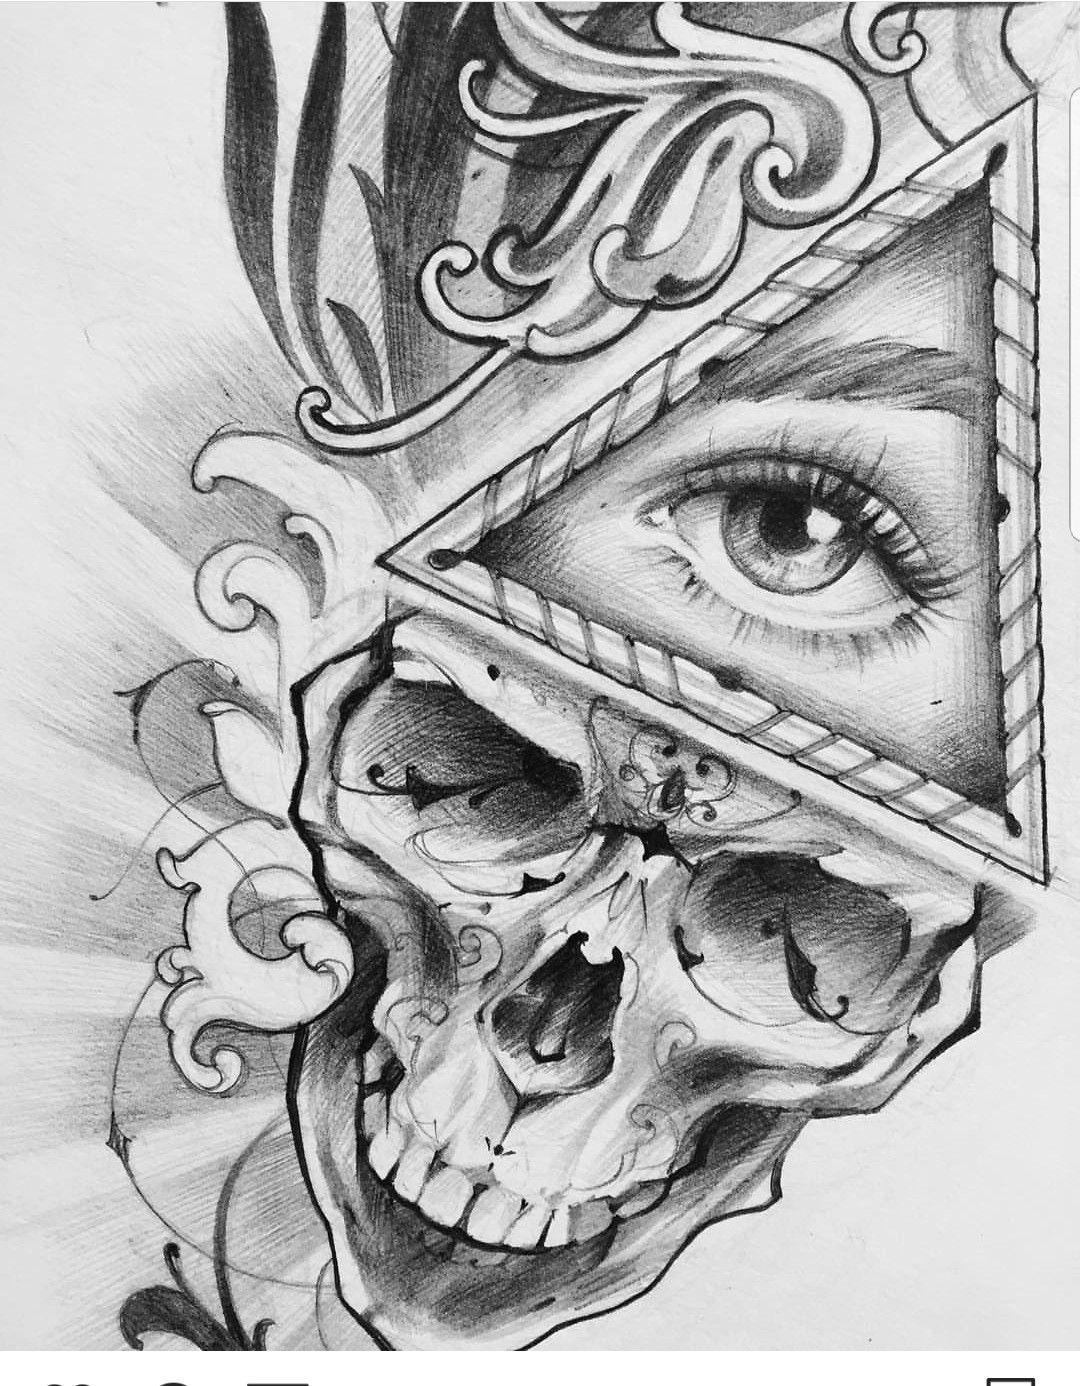 Illuminati eye tattoo image by Cj Molina on Art Skull